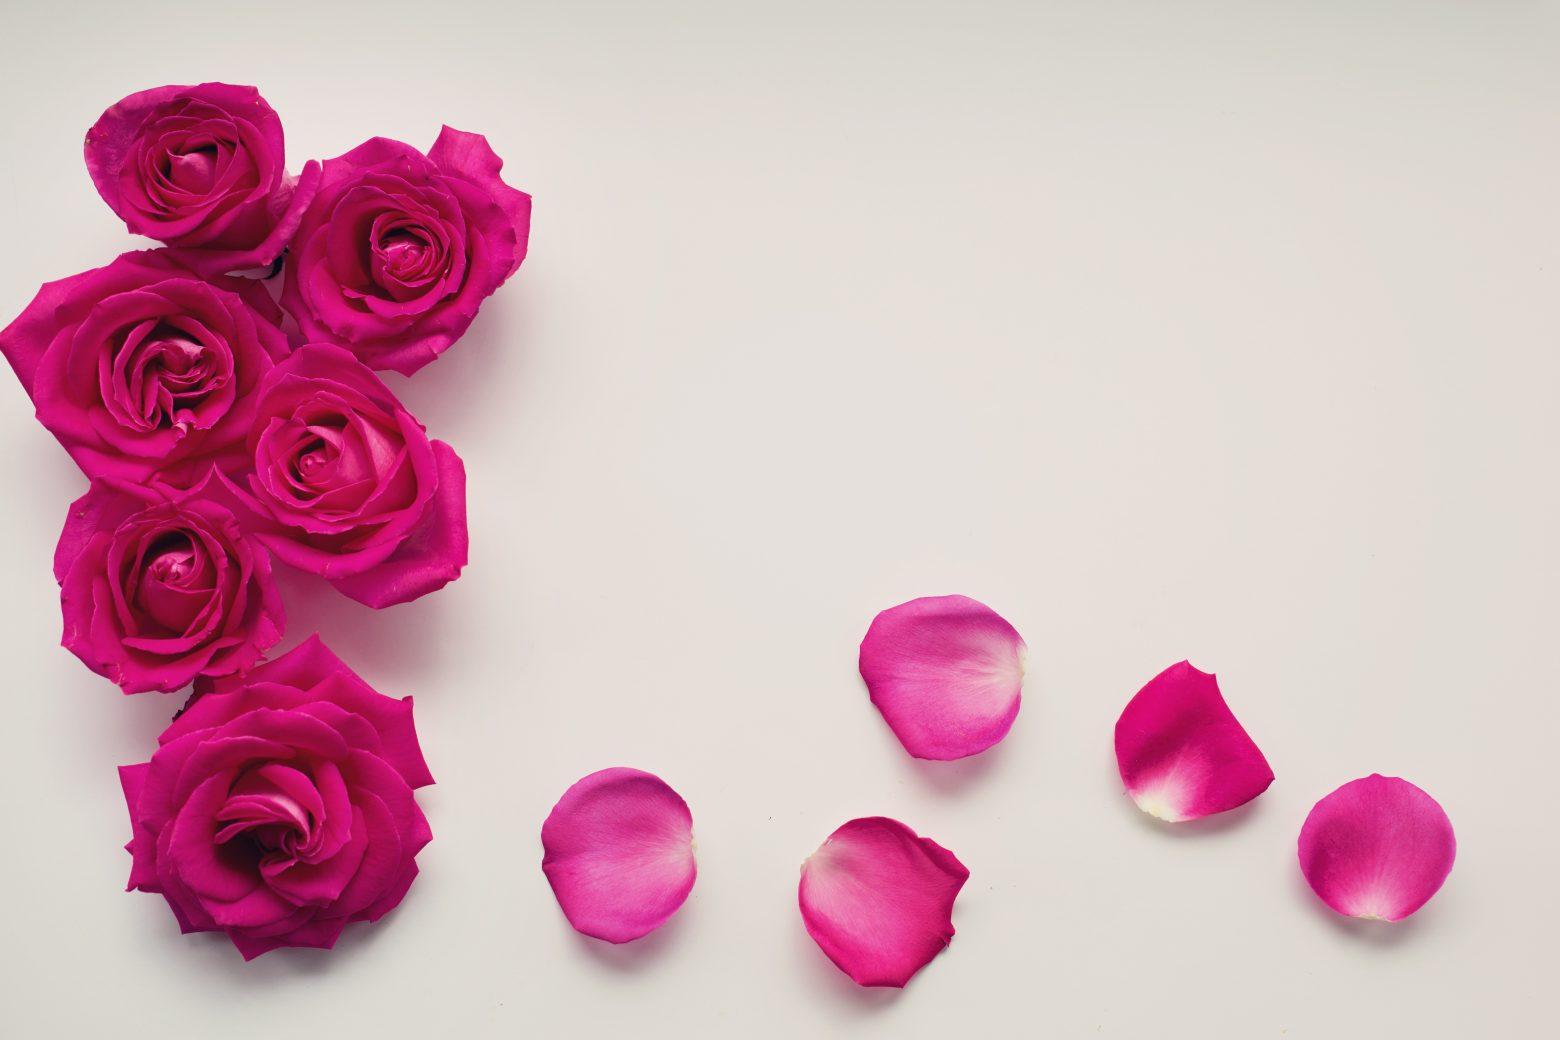 roses-2249400